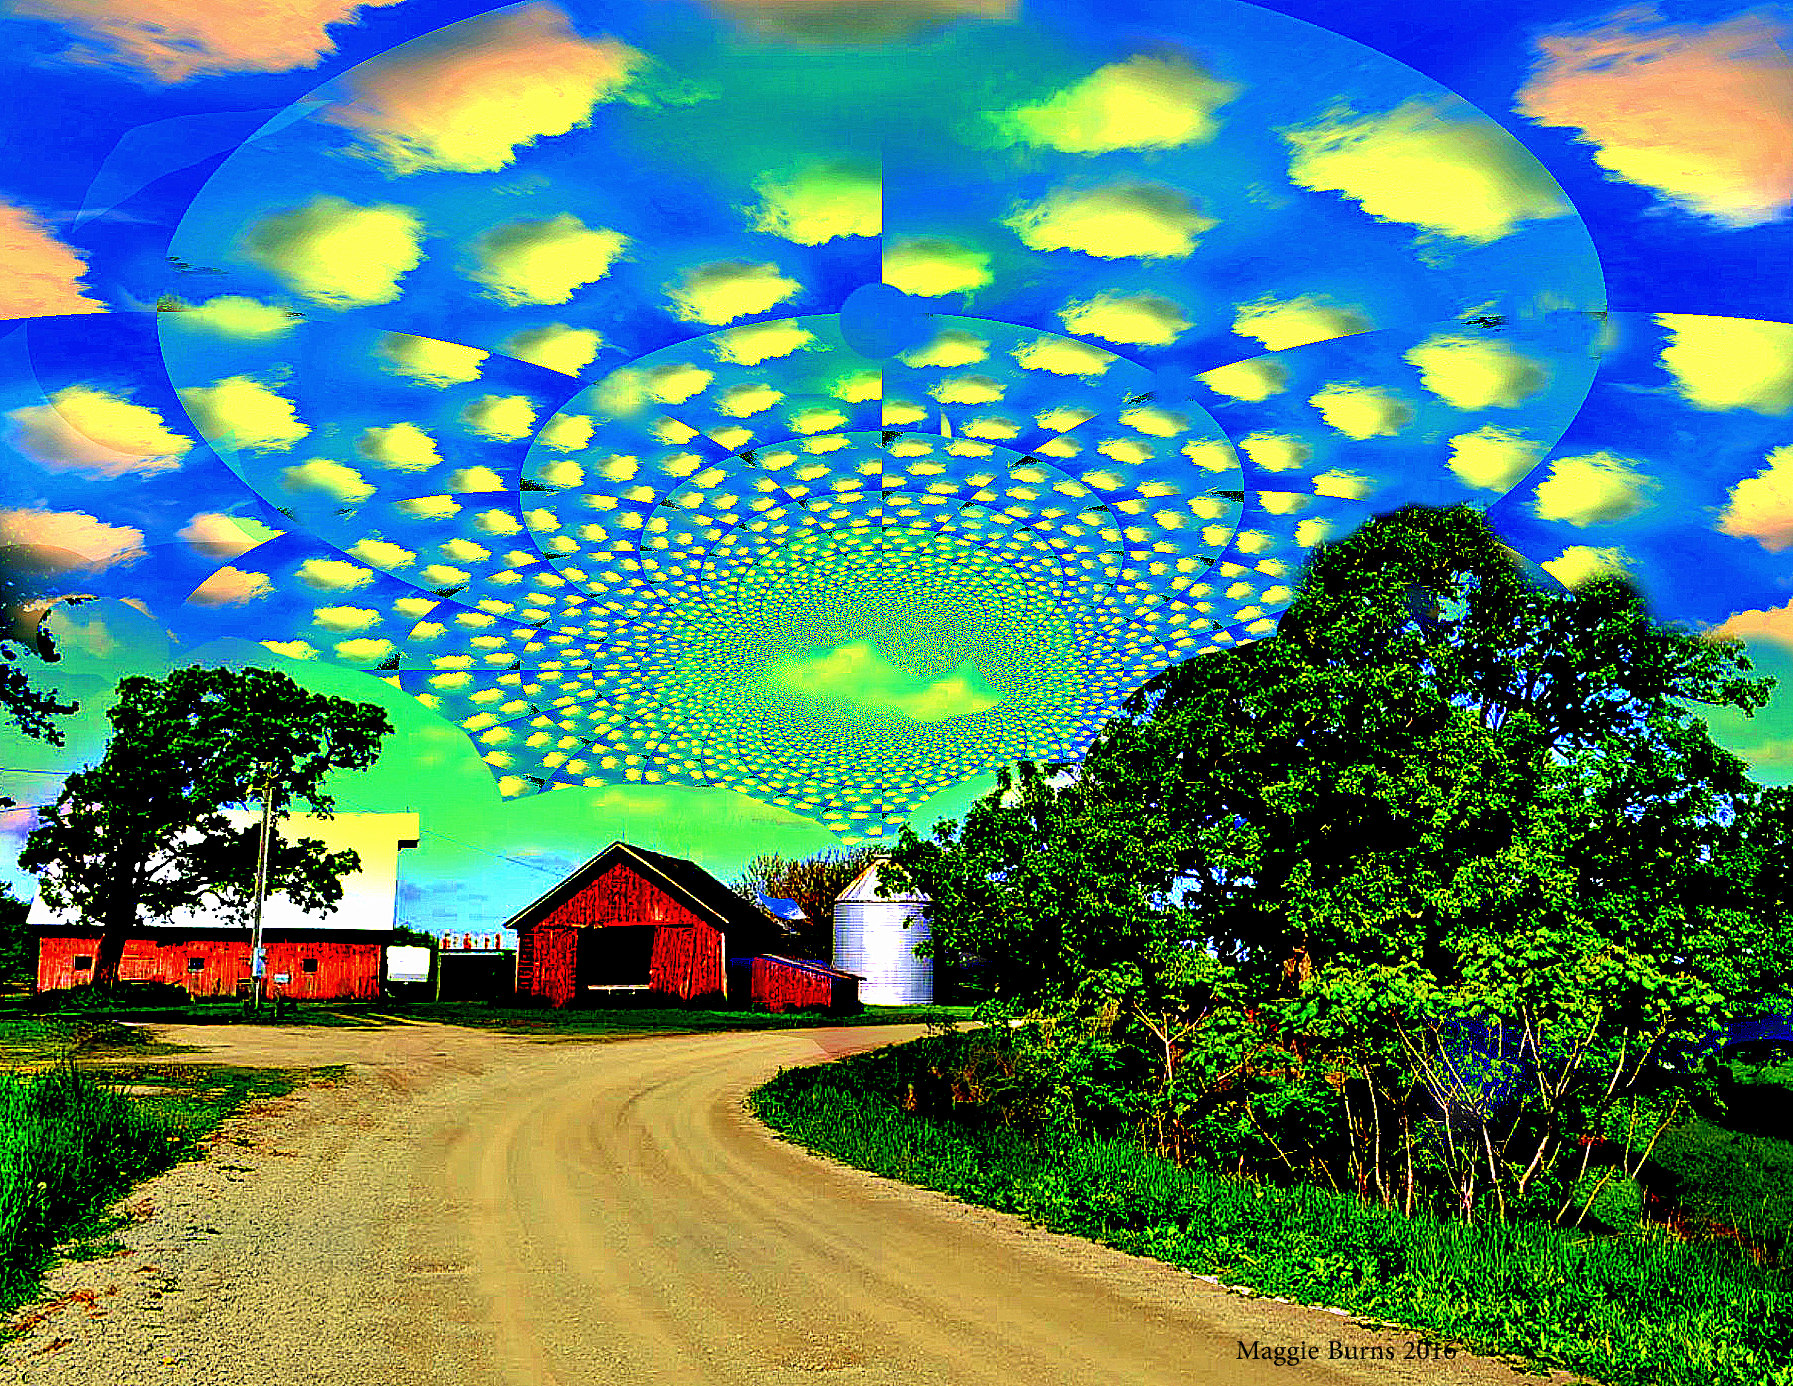 Barnrise (north of Iowa City) Maggie Burns 2014  11x17 $60, 13x19 $80, 8x11 $50